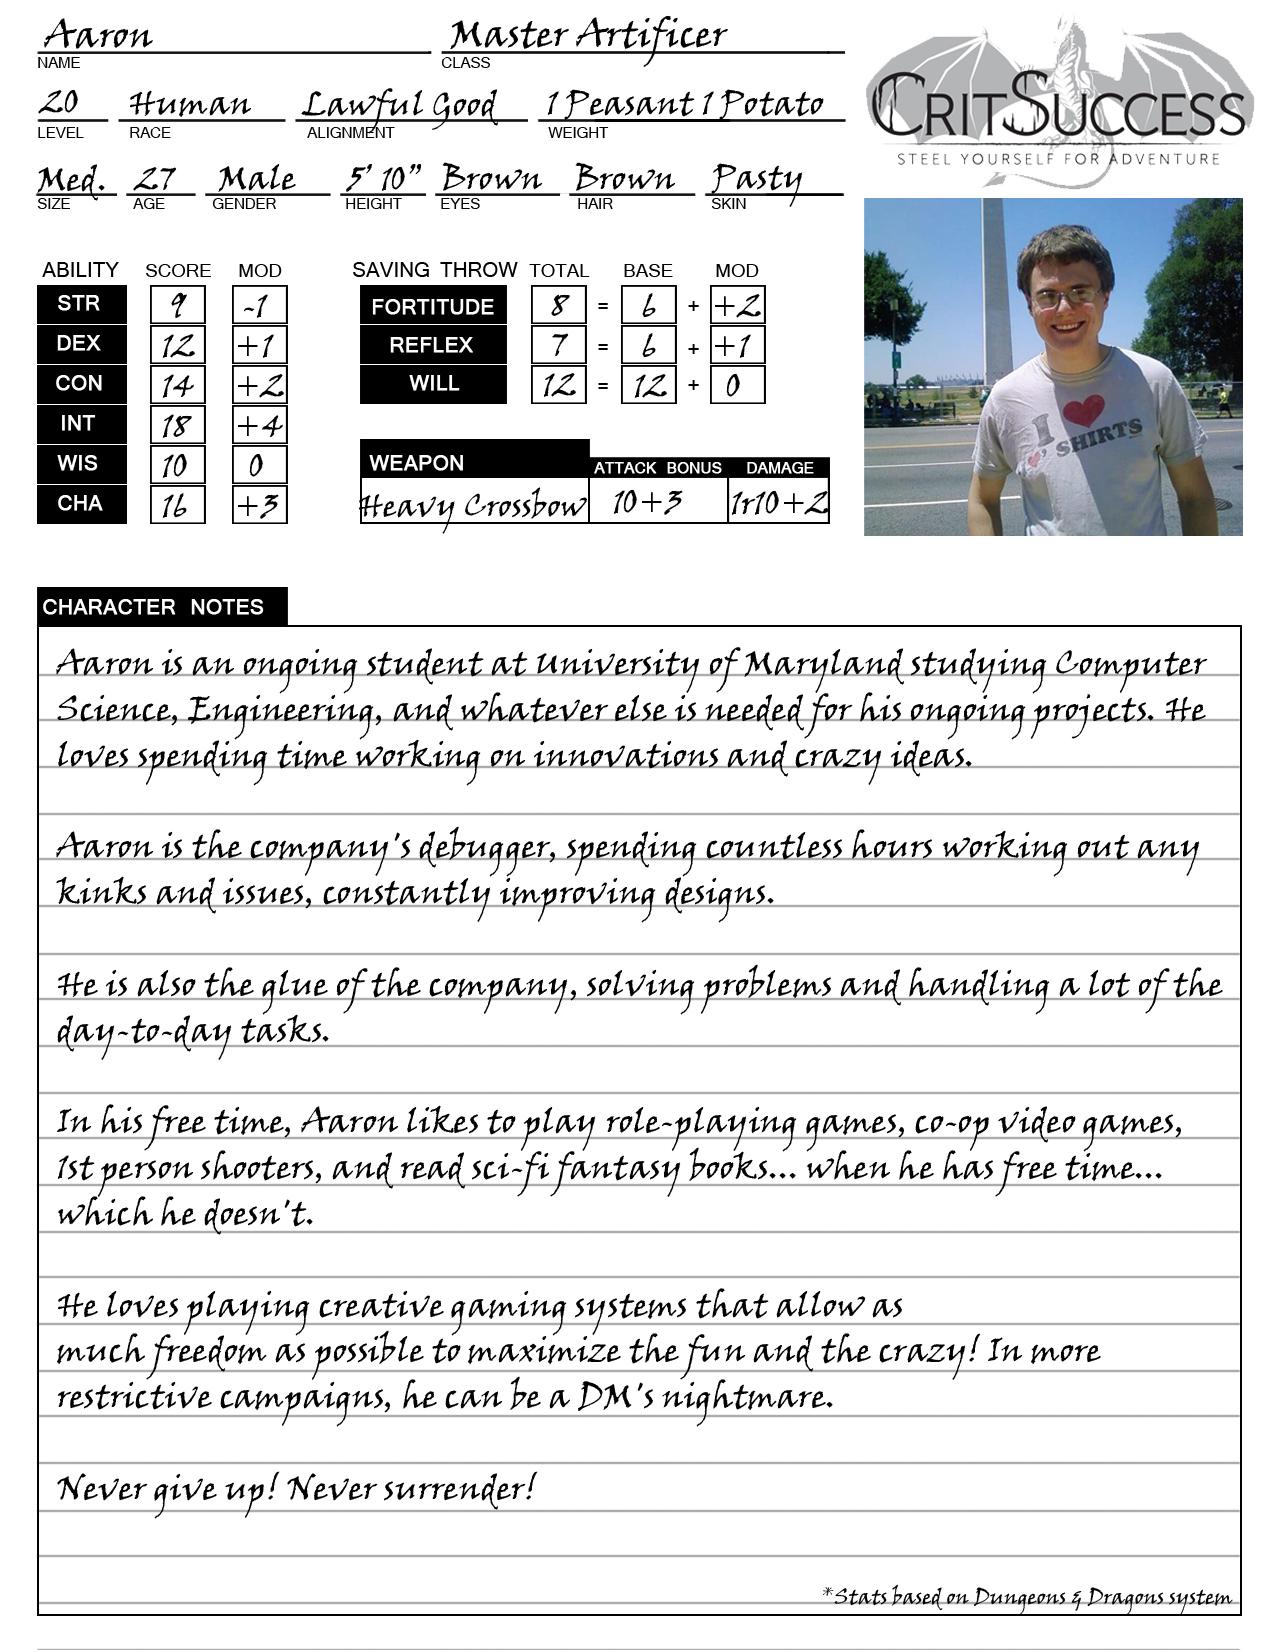 Aaron's Character Sheet